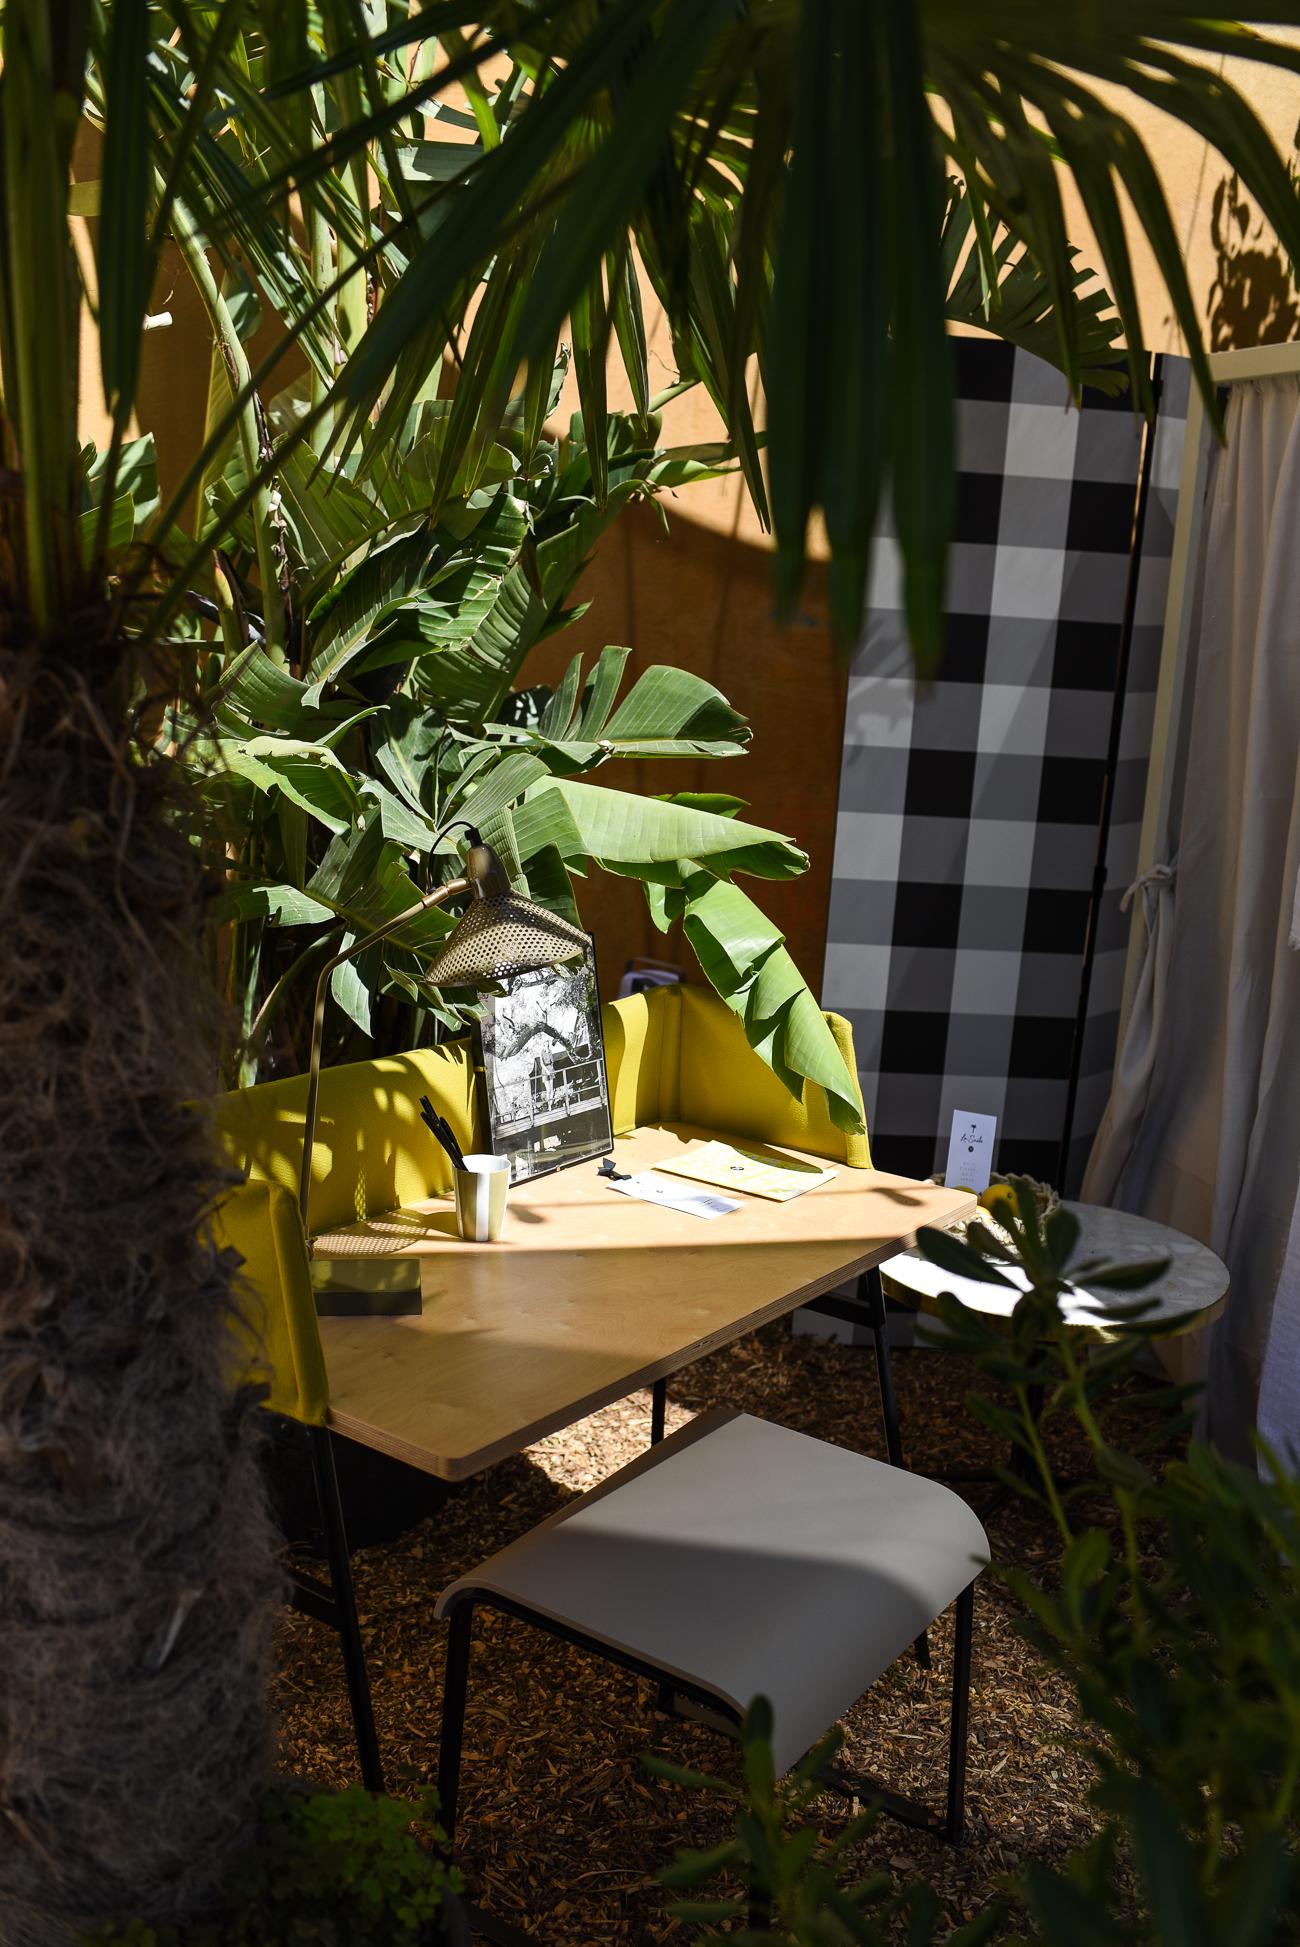 le-studio-twinky-photographe-salon-vivre-cote-sud-2019-aix-en-provence-36.jpg